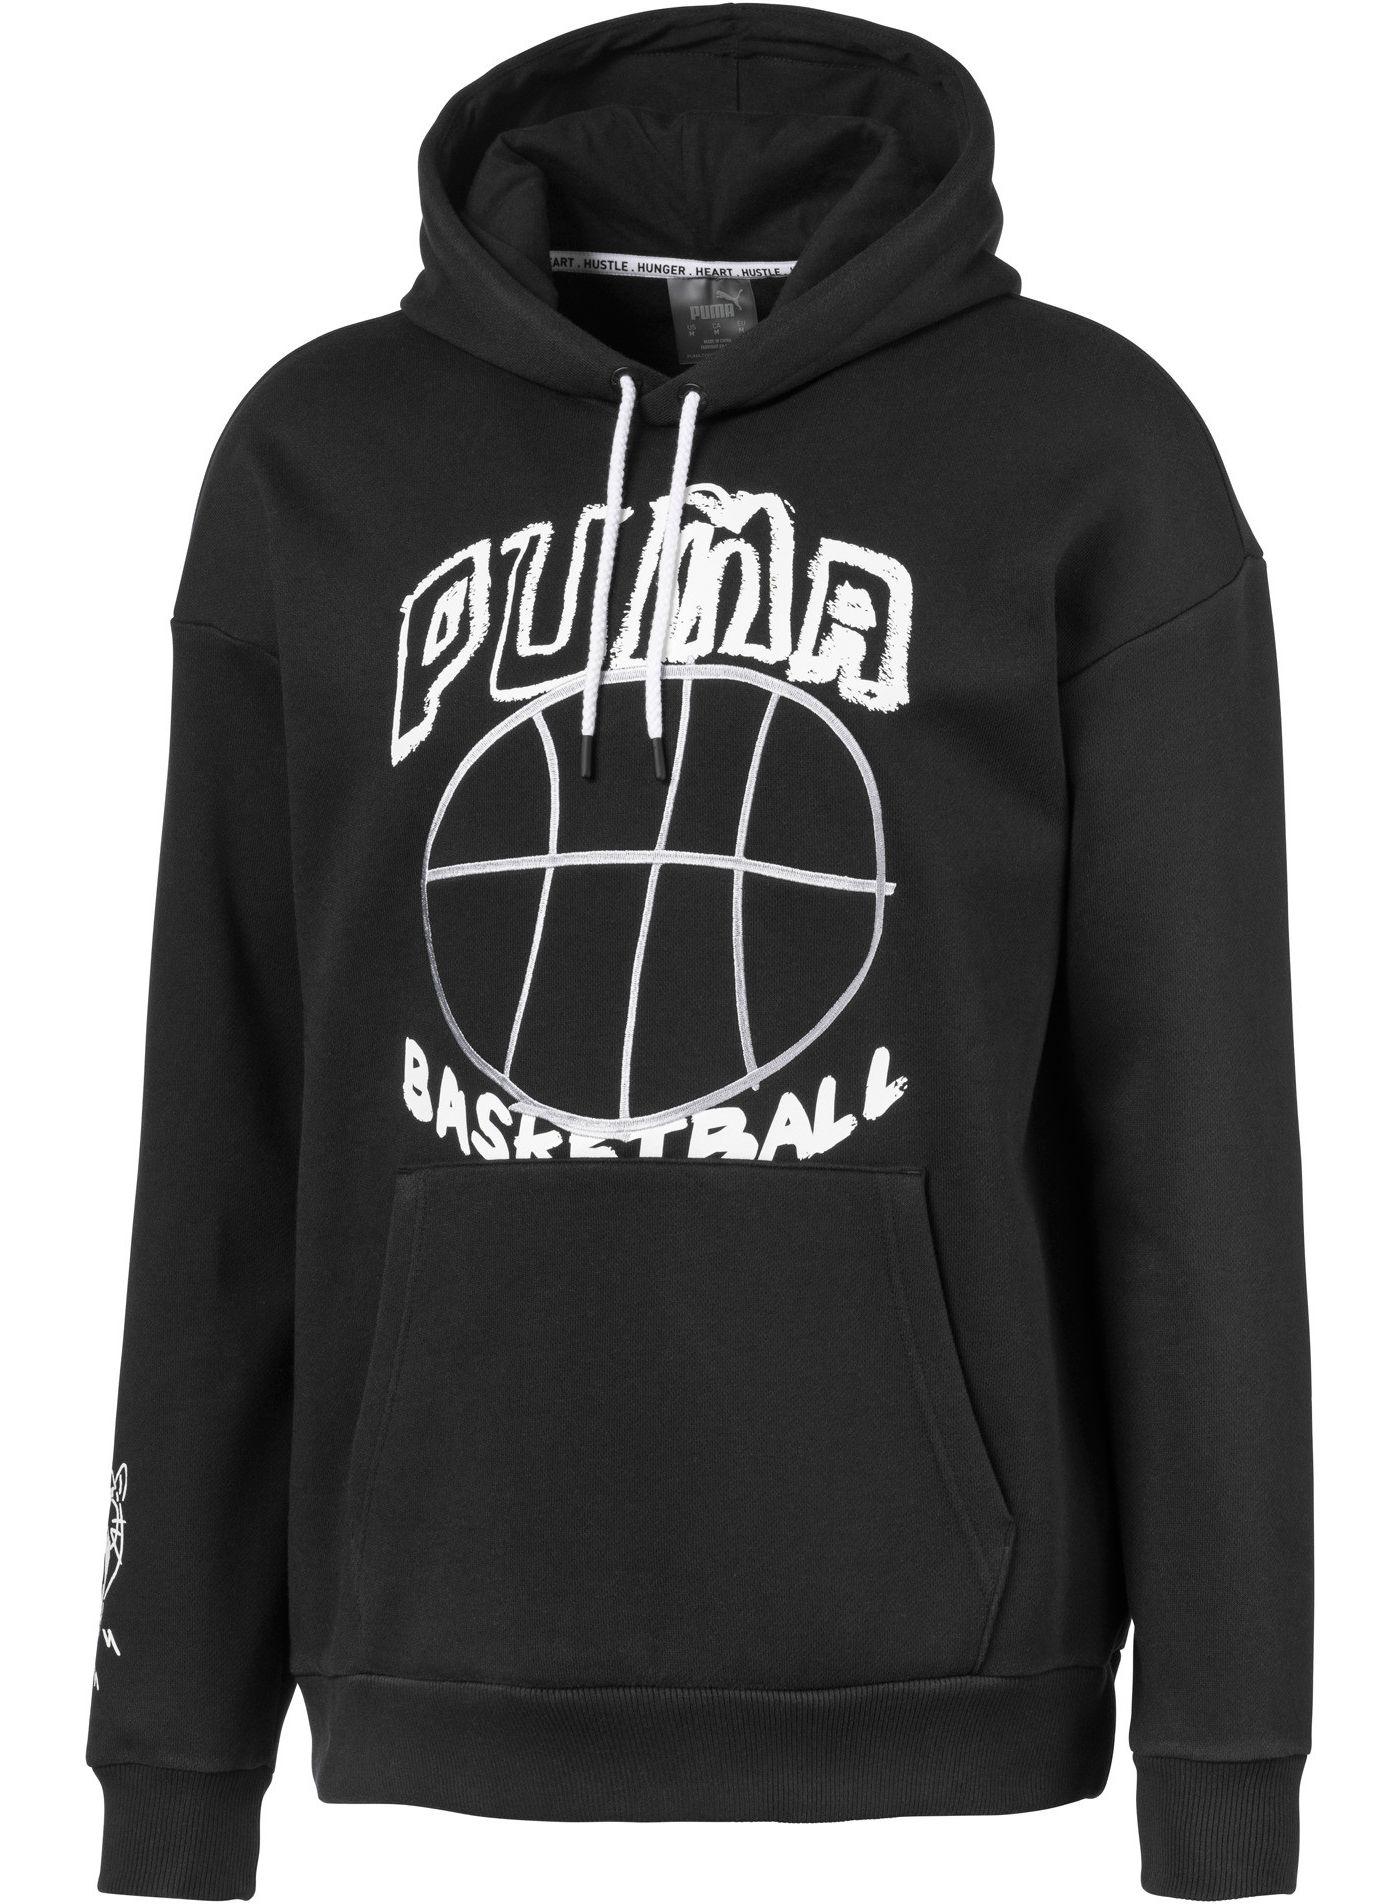 PUMA Men's Hoops Pass The Rock Graphic Basketball Hoodie